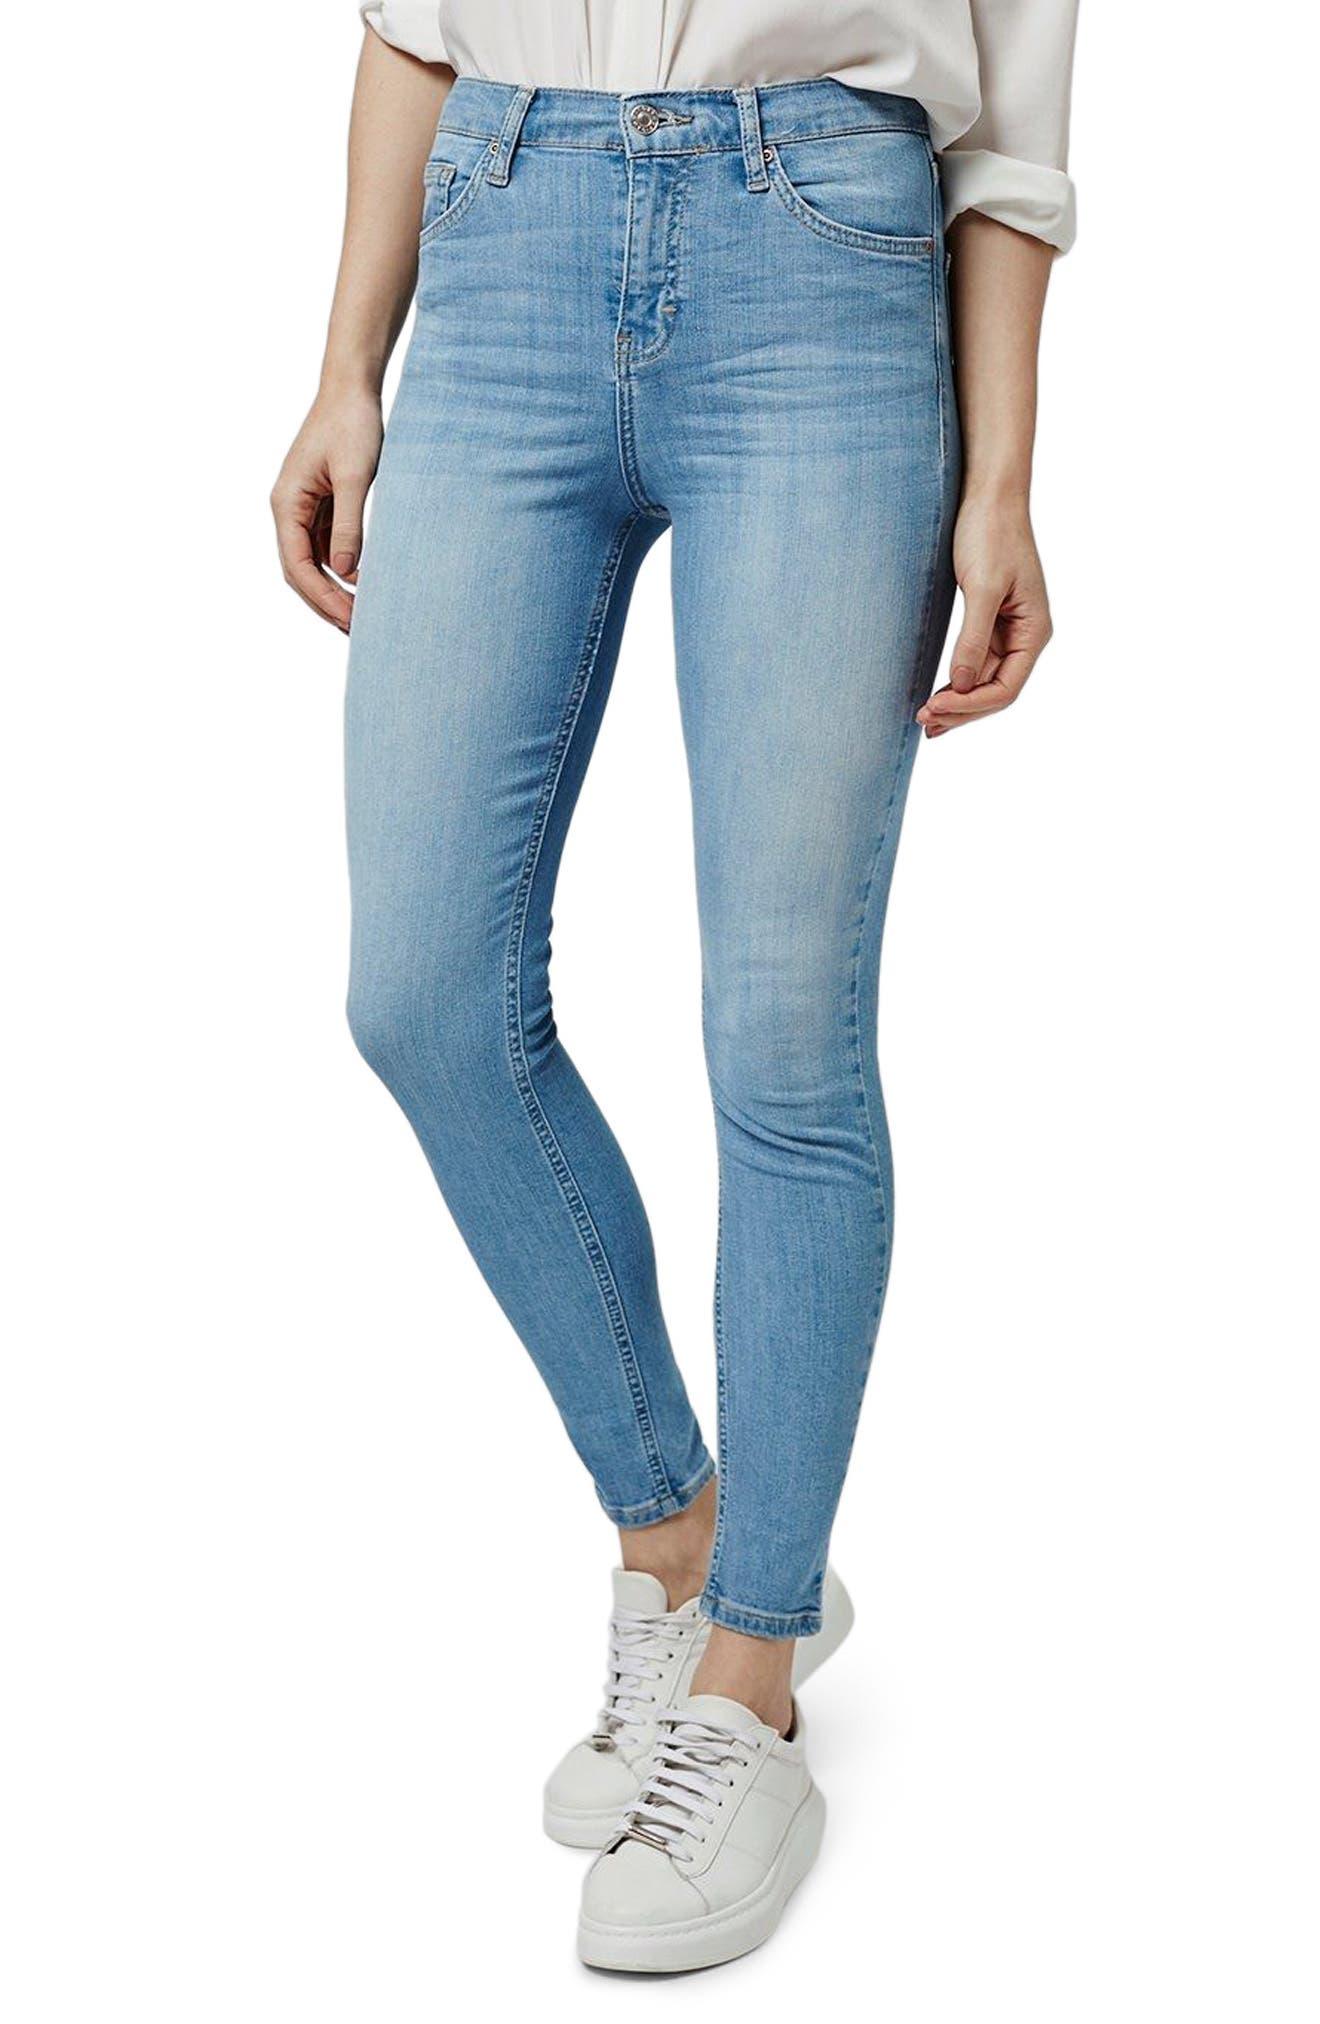 TOPSHOP, Moto Jamie High Waist Skinny Jeans, Main thumbnail 1, color, 450